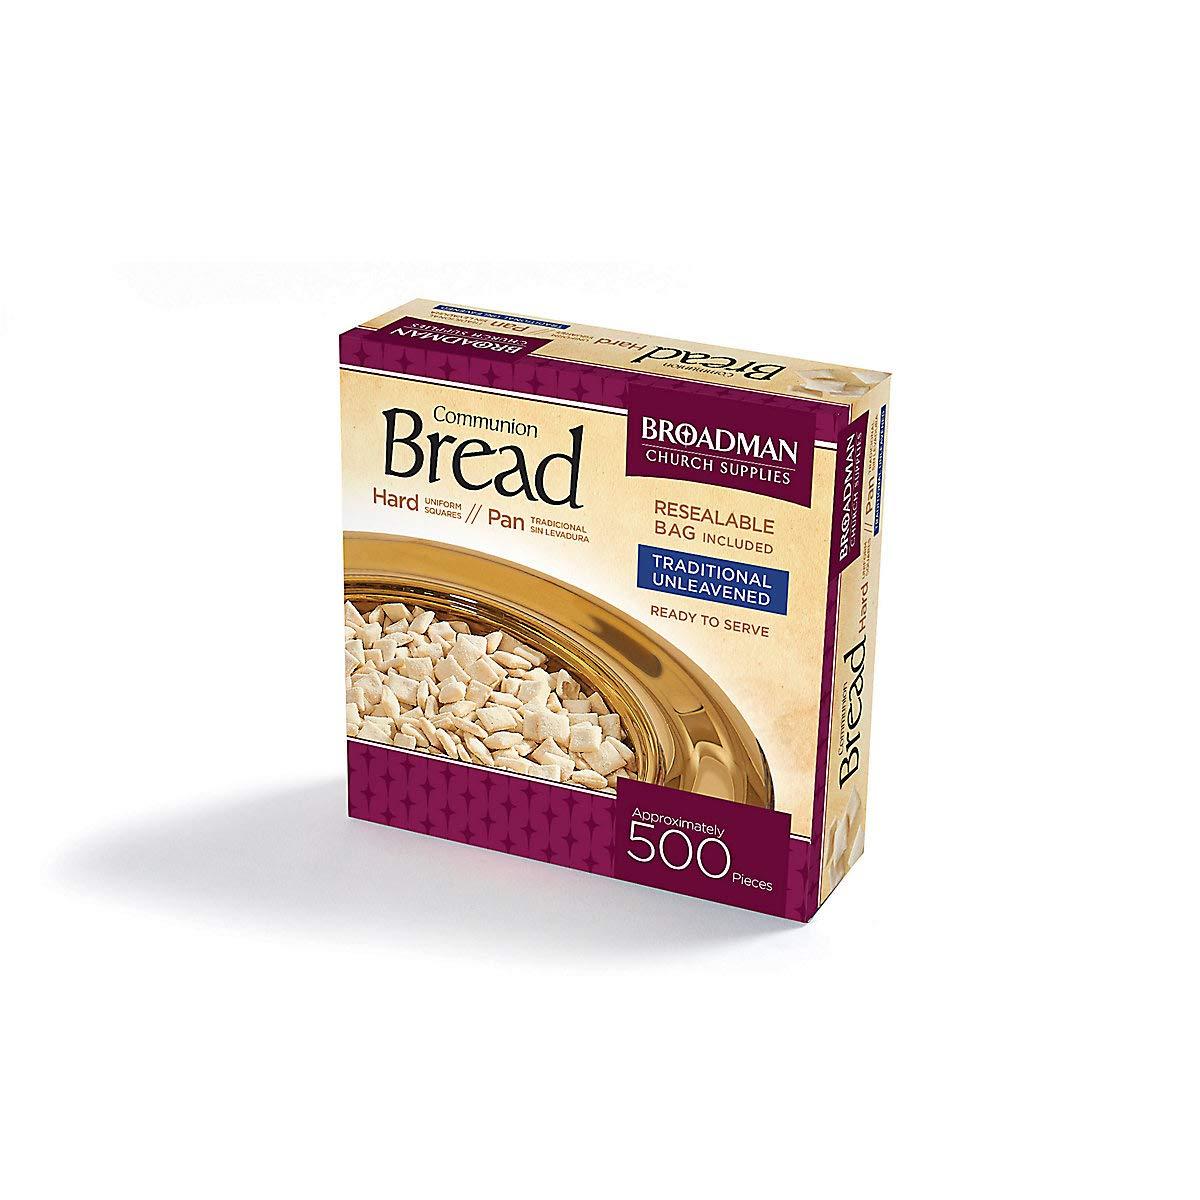 Broadman Church Supplies Communion Bread, 500 Count